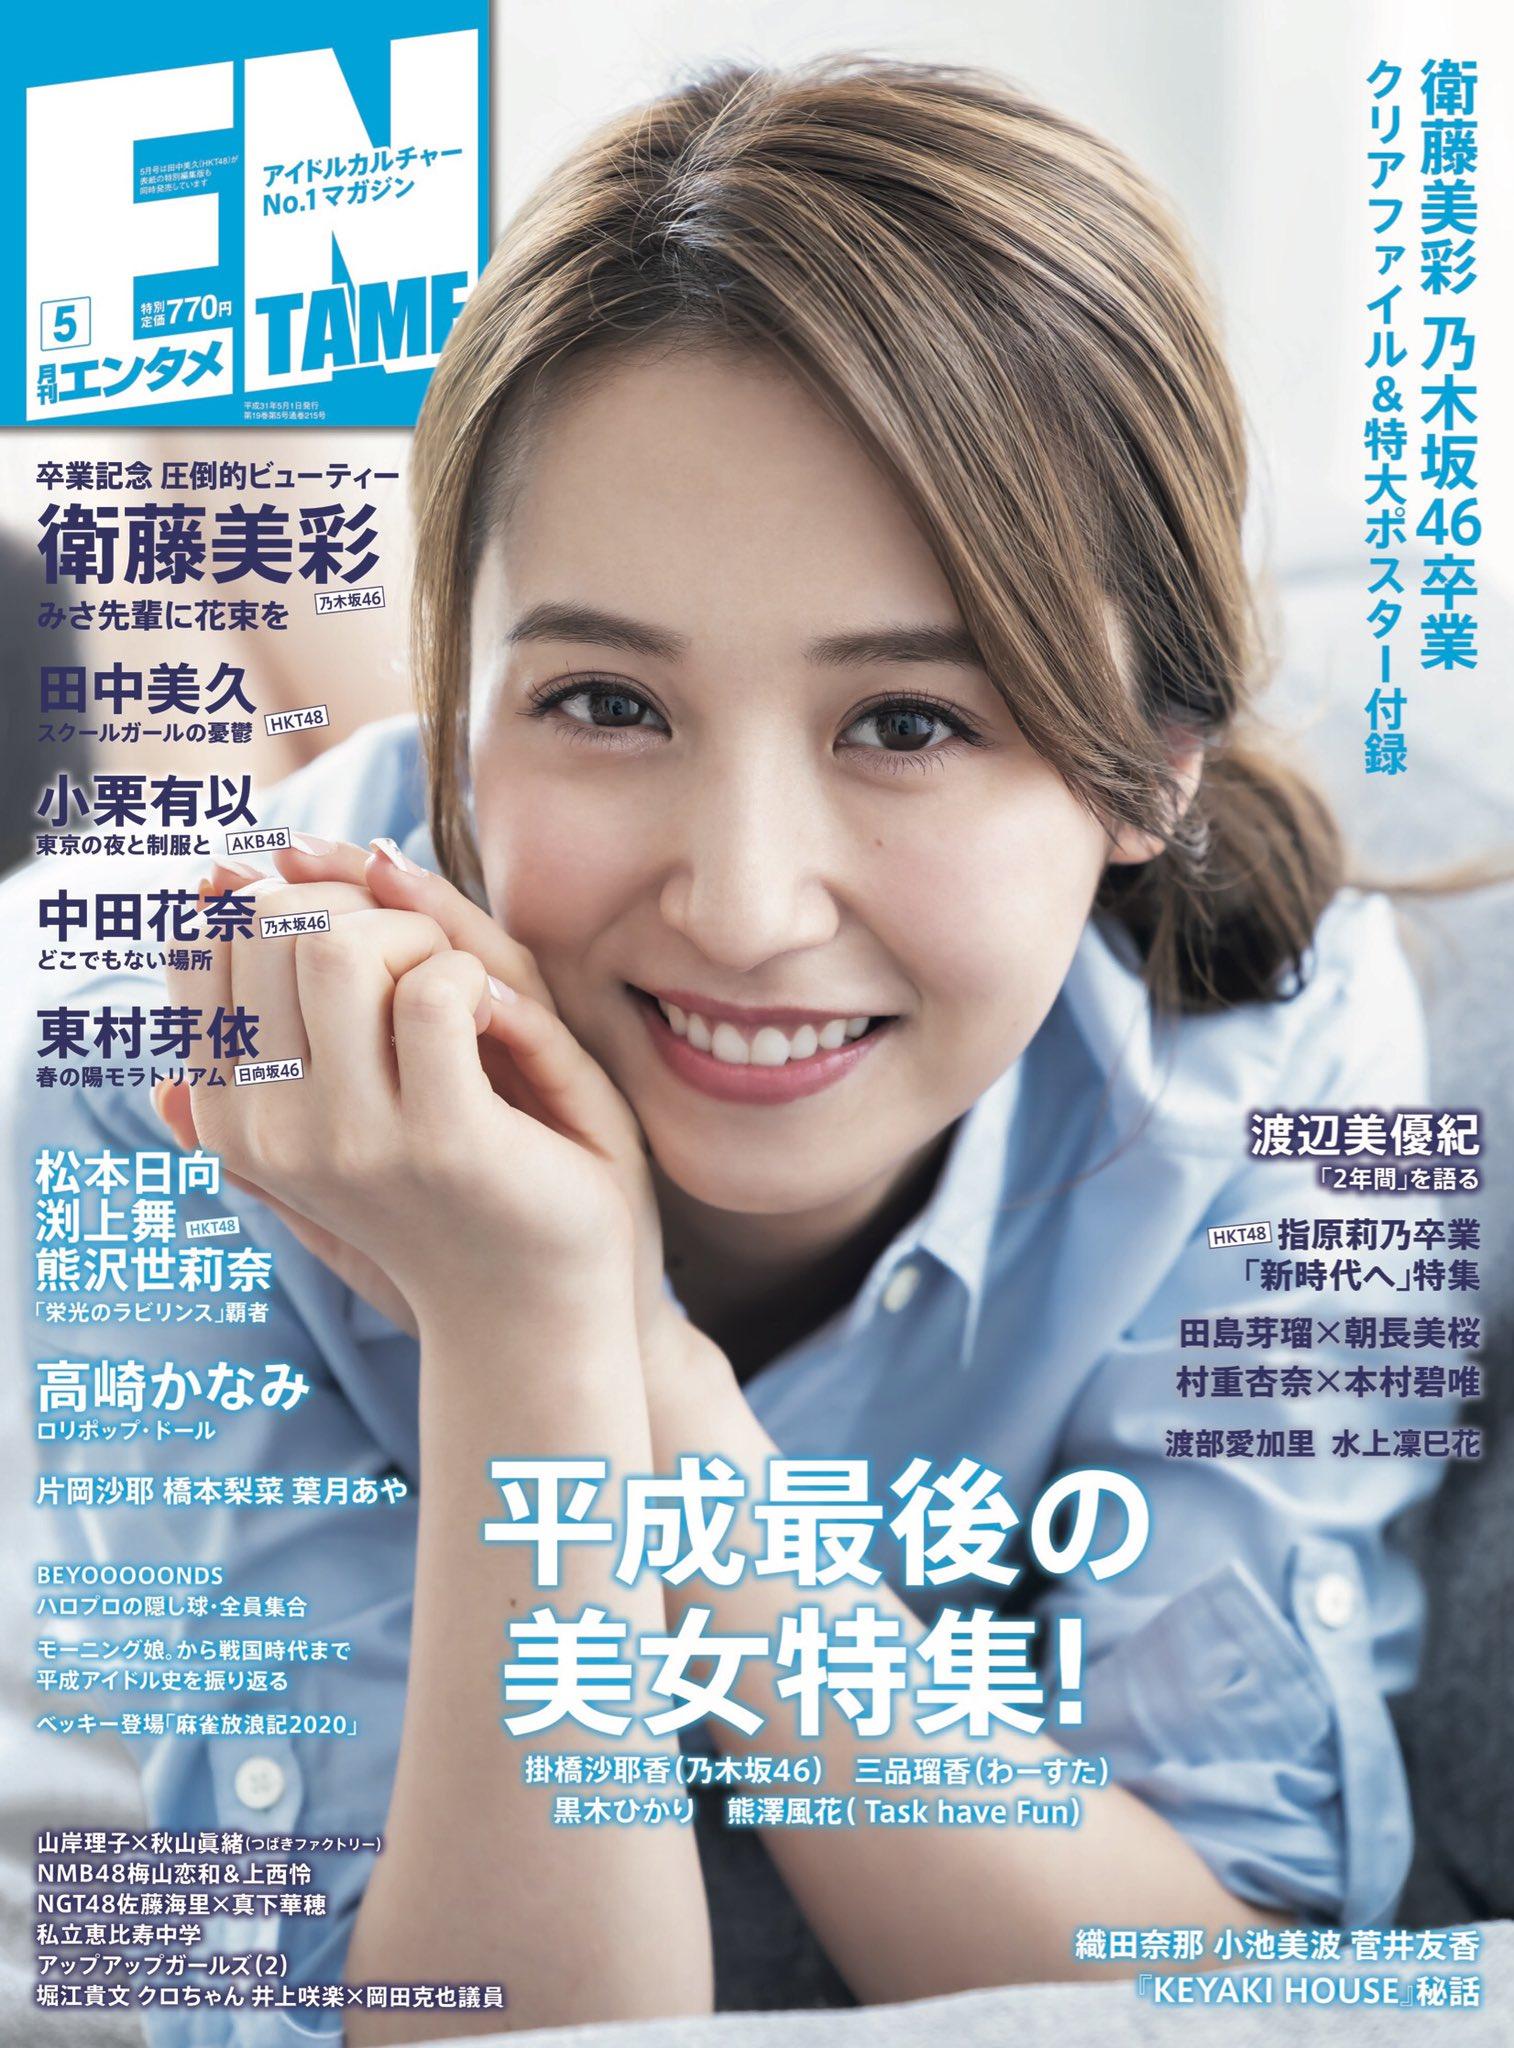 ENTAME(エンタメ)2019年5月号 表紙 衛藤美彩